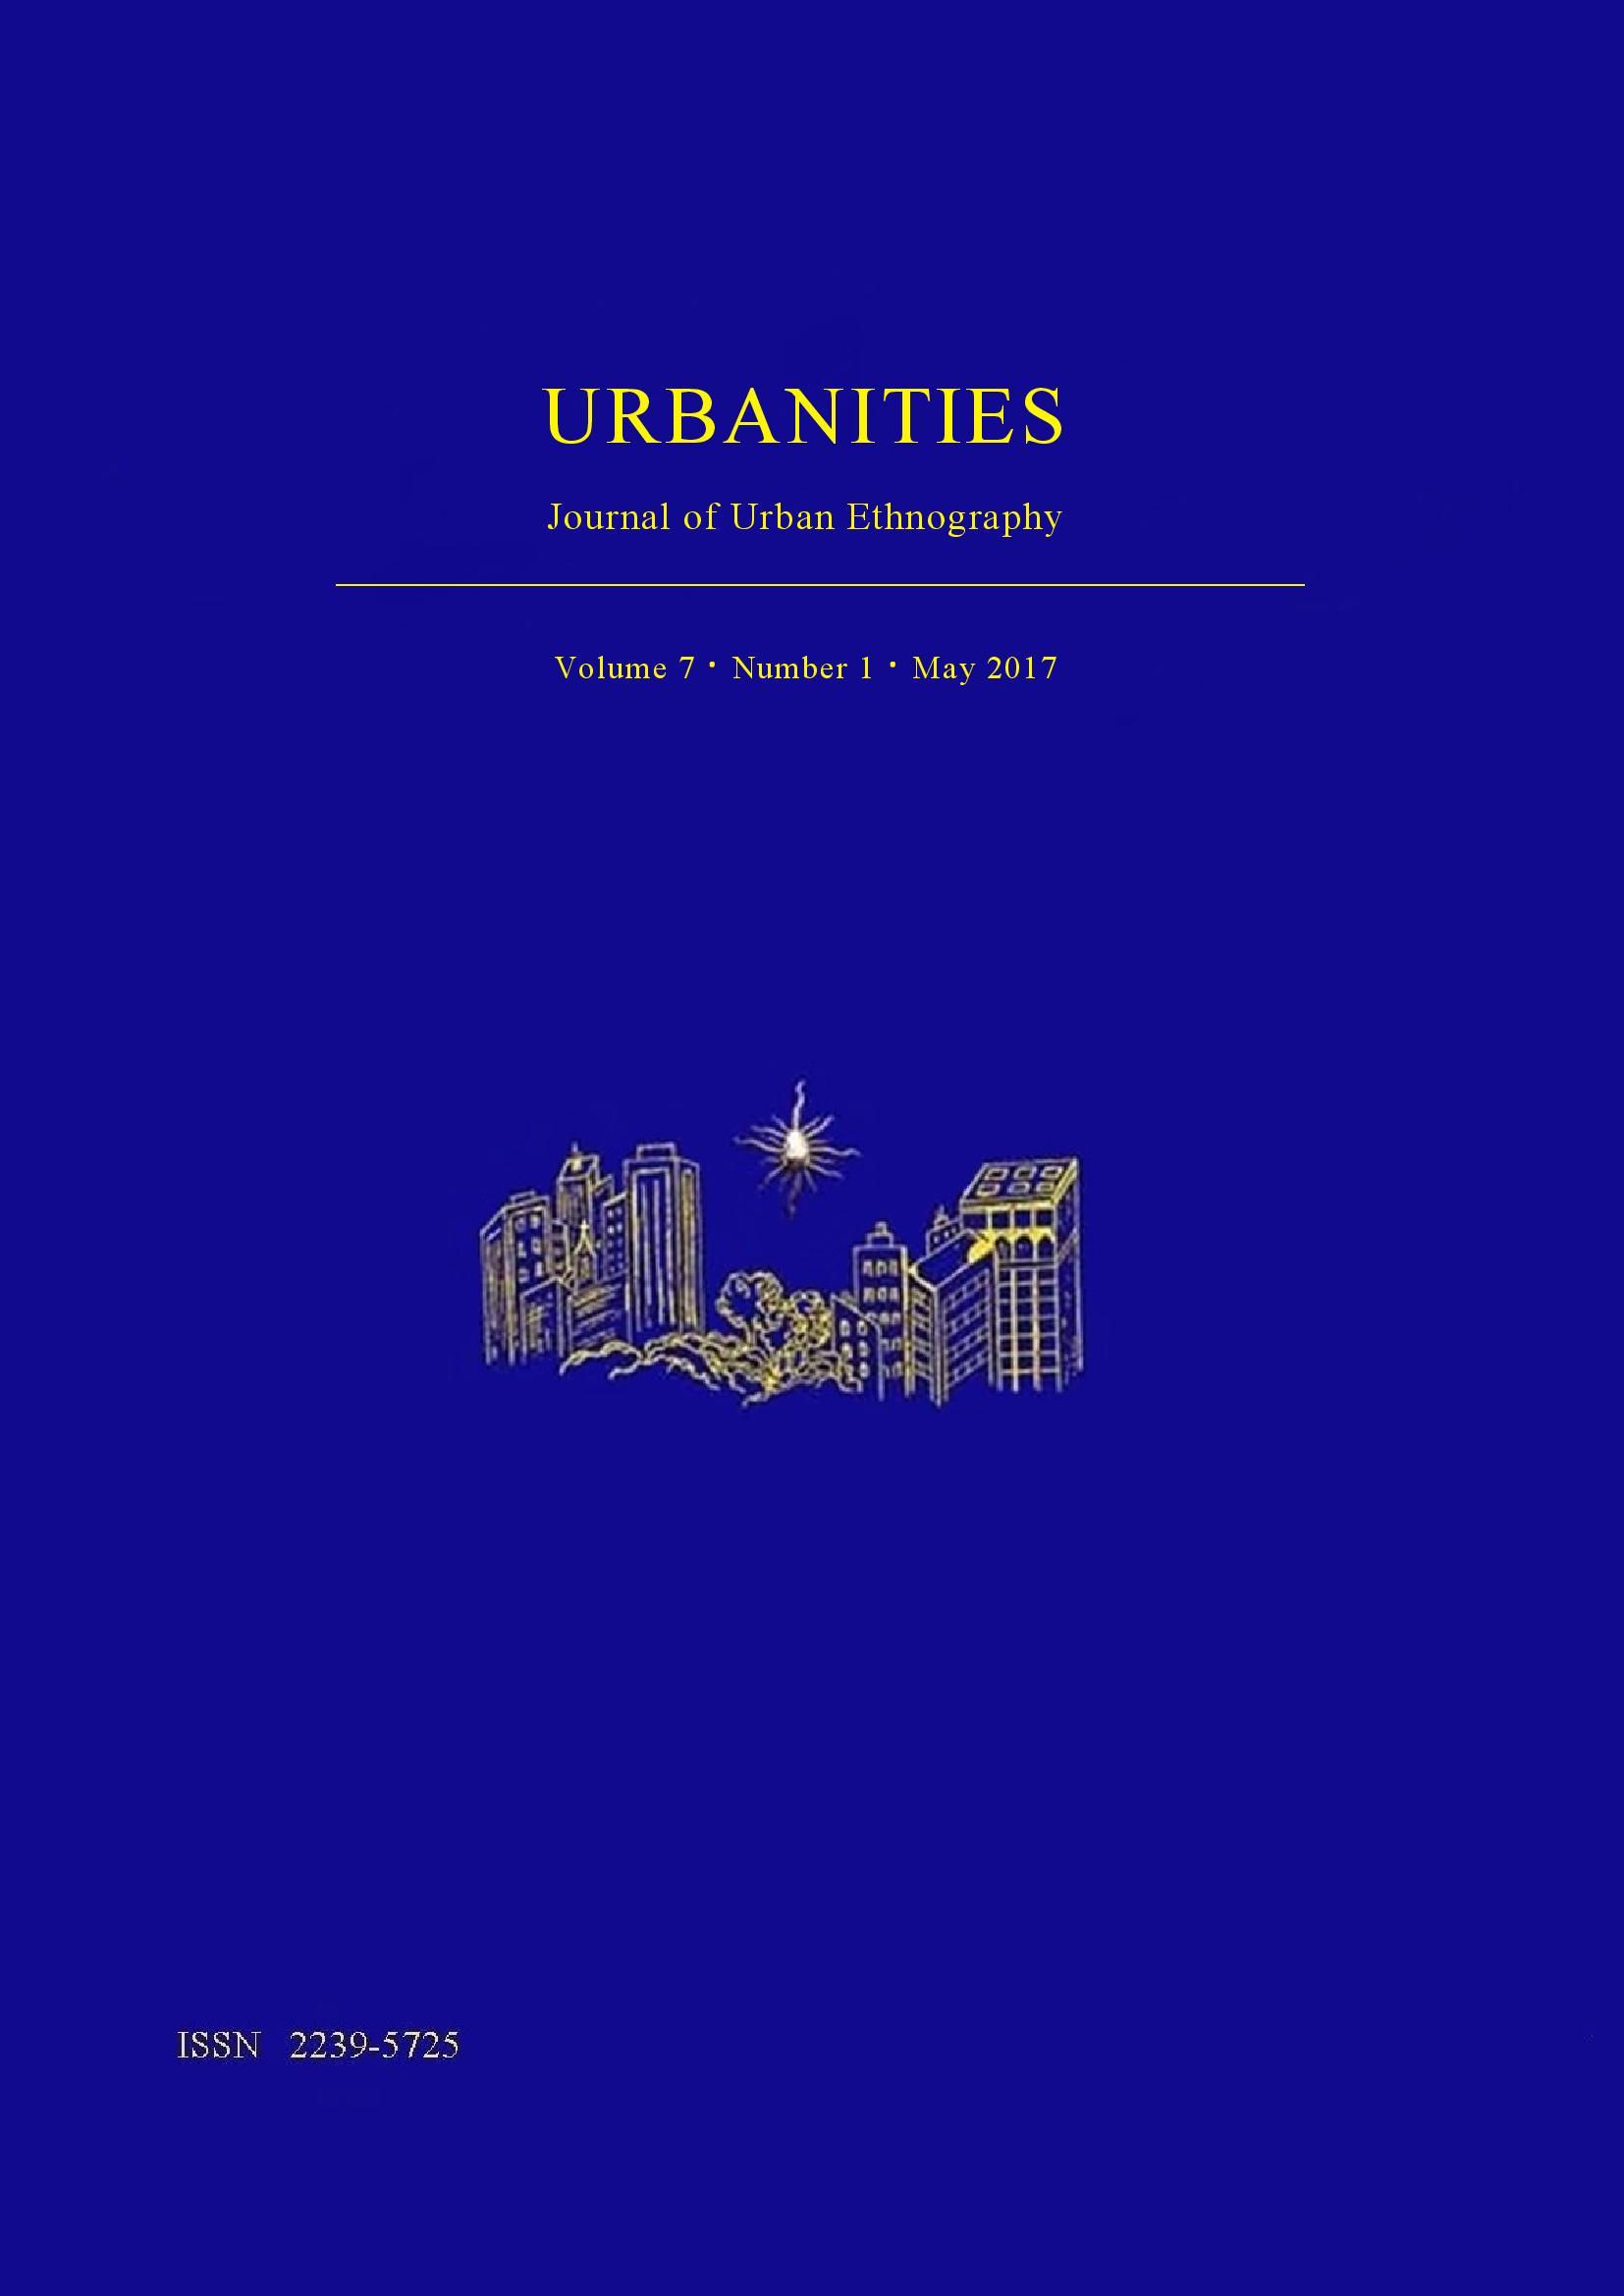 urbanities